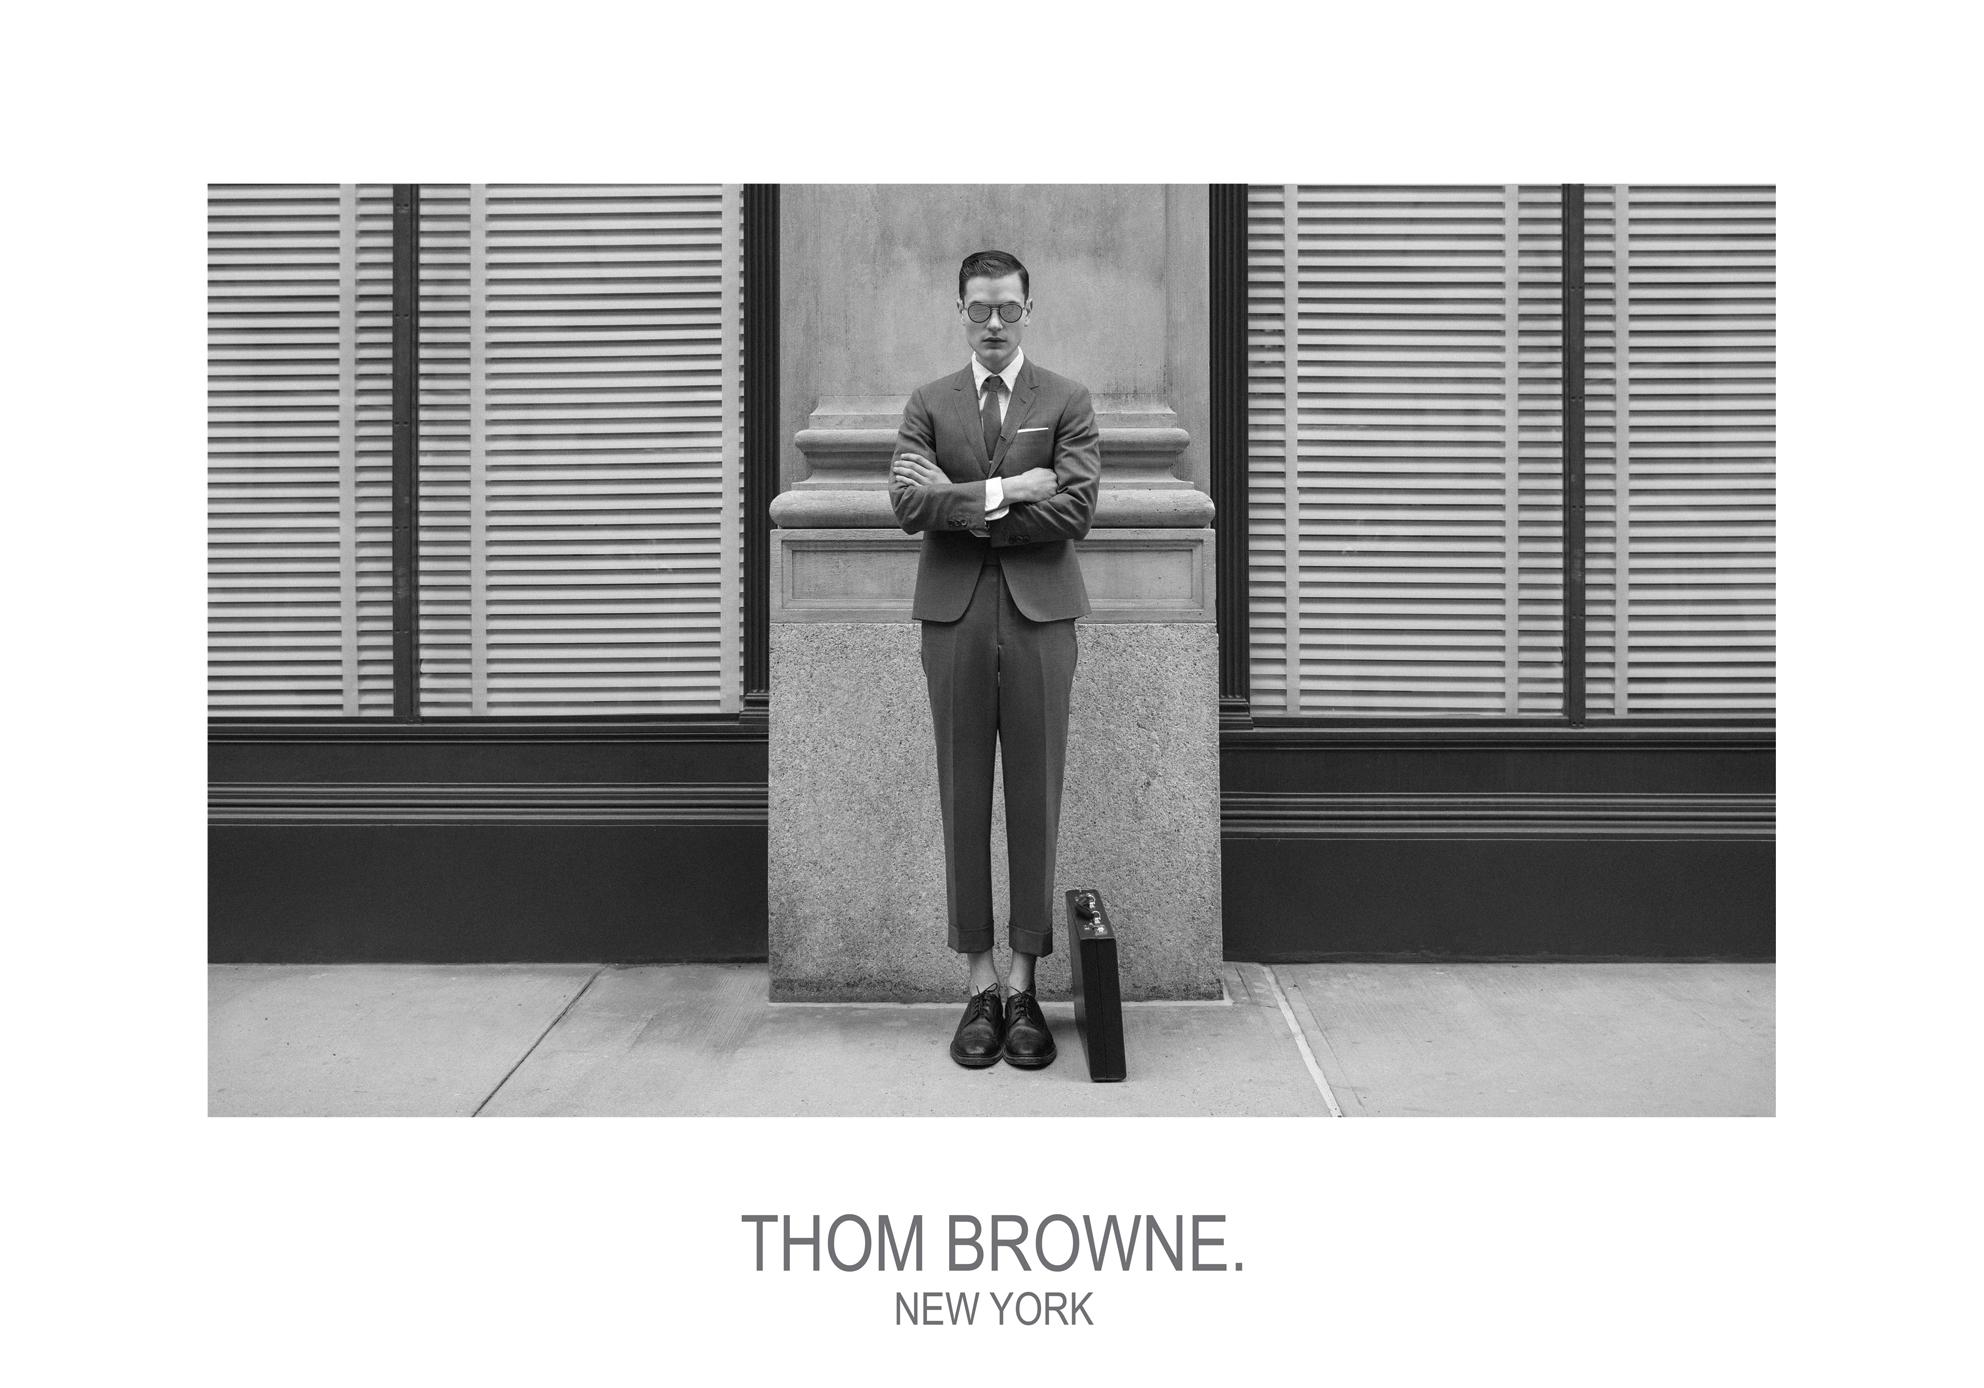 THOM BROWNE.(トムブラウン)